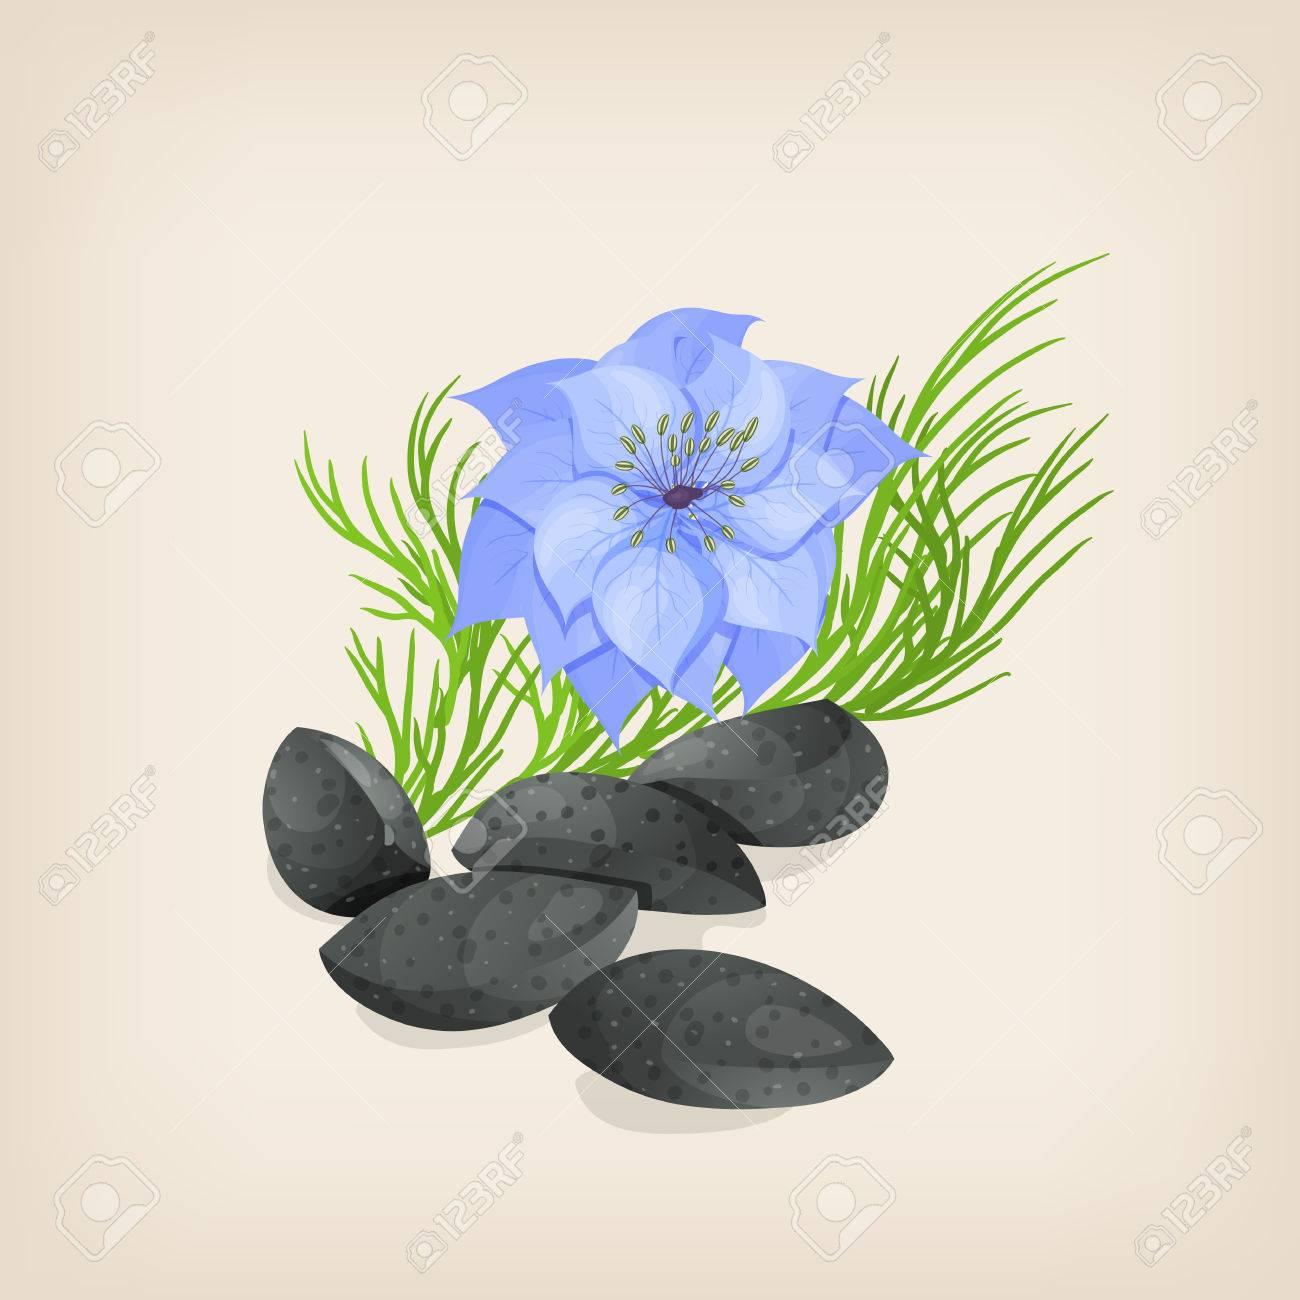 Nigella sativa or fennel flower, nutmeg flower, black caraway, Roman coriander, black cumin, black sesame, blackseed, black caraway, Bunium persicum. - 64531129